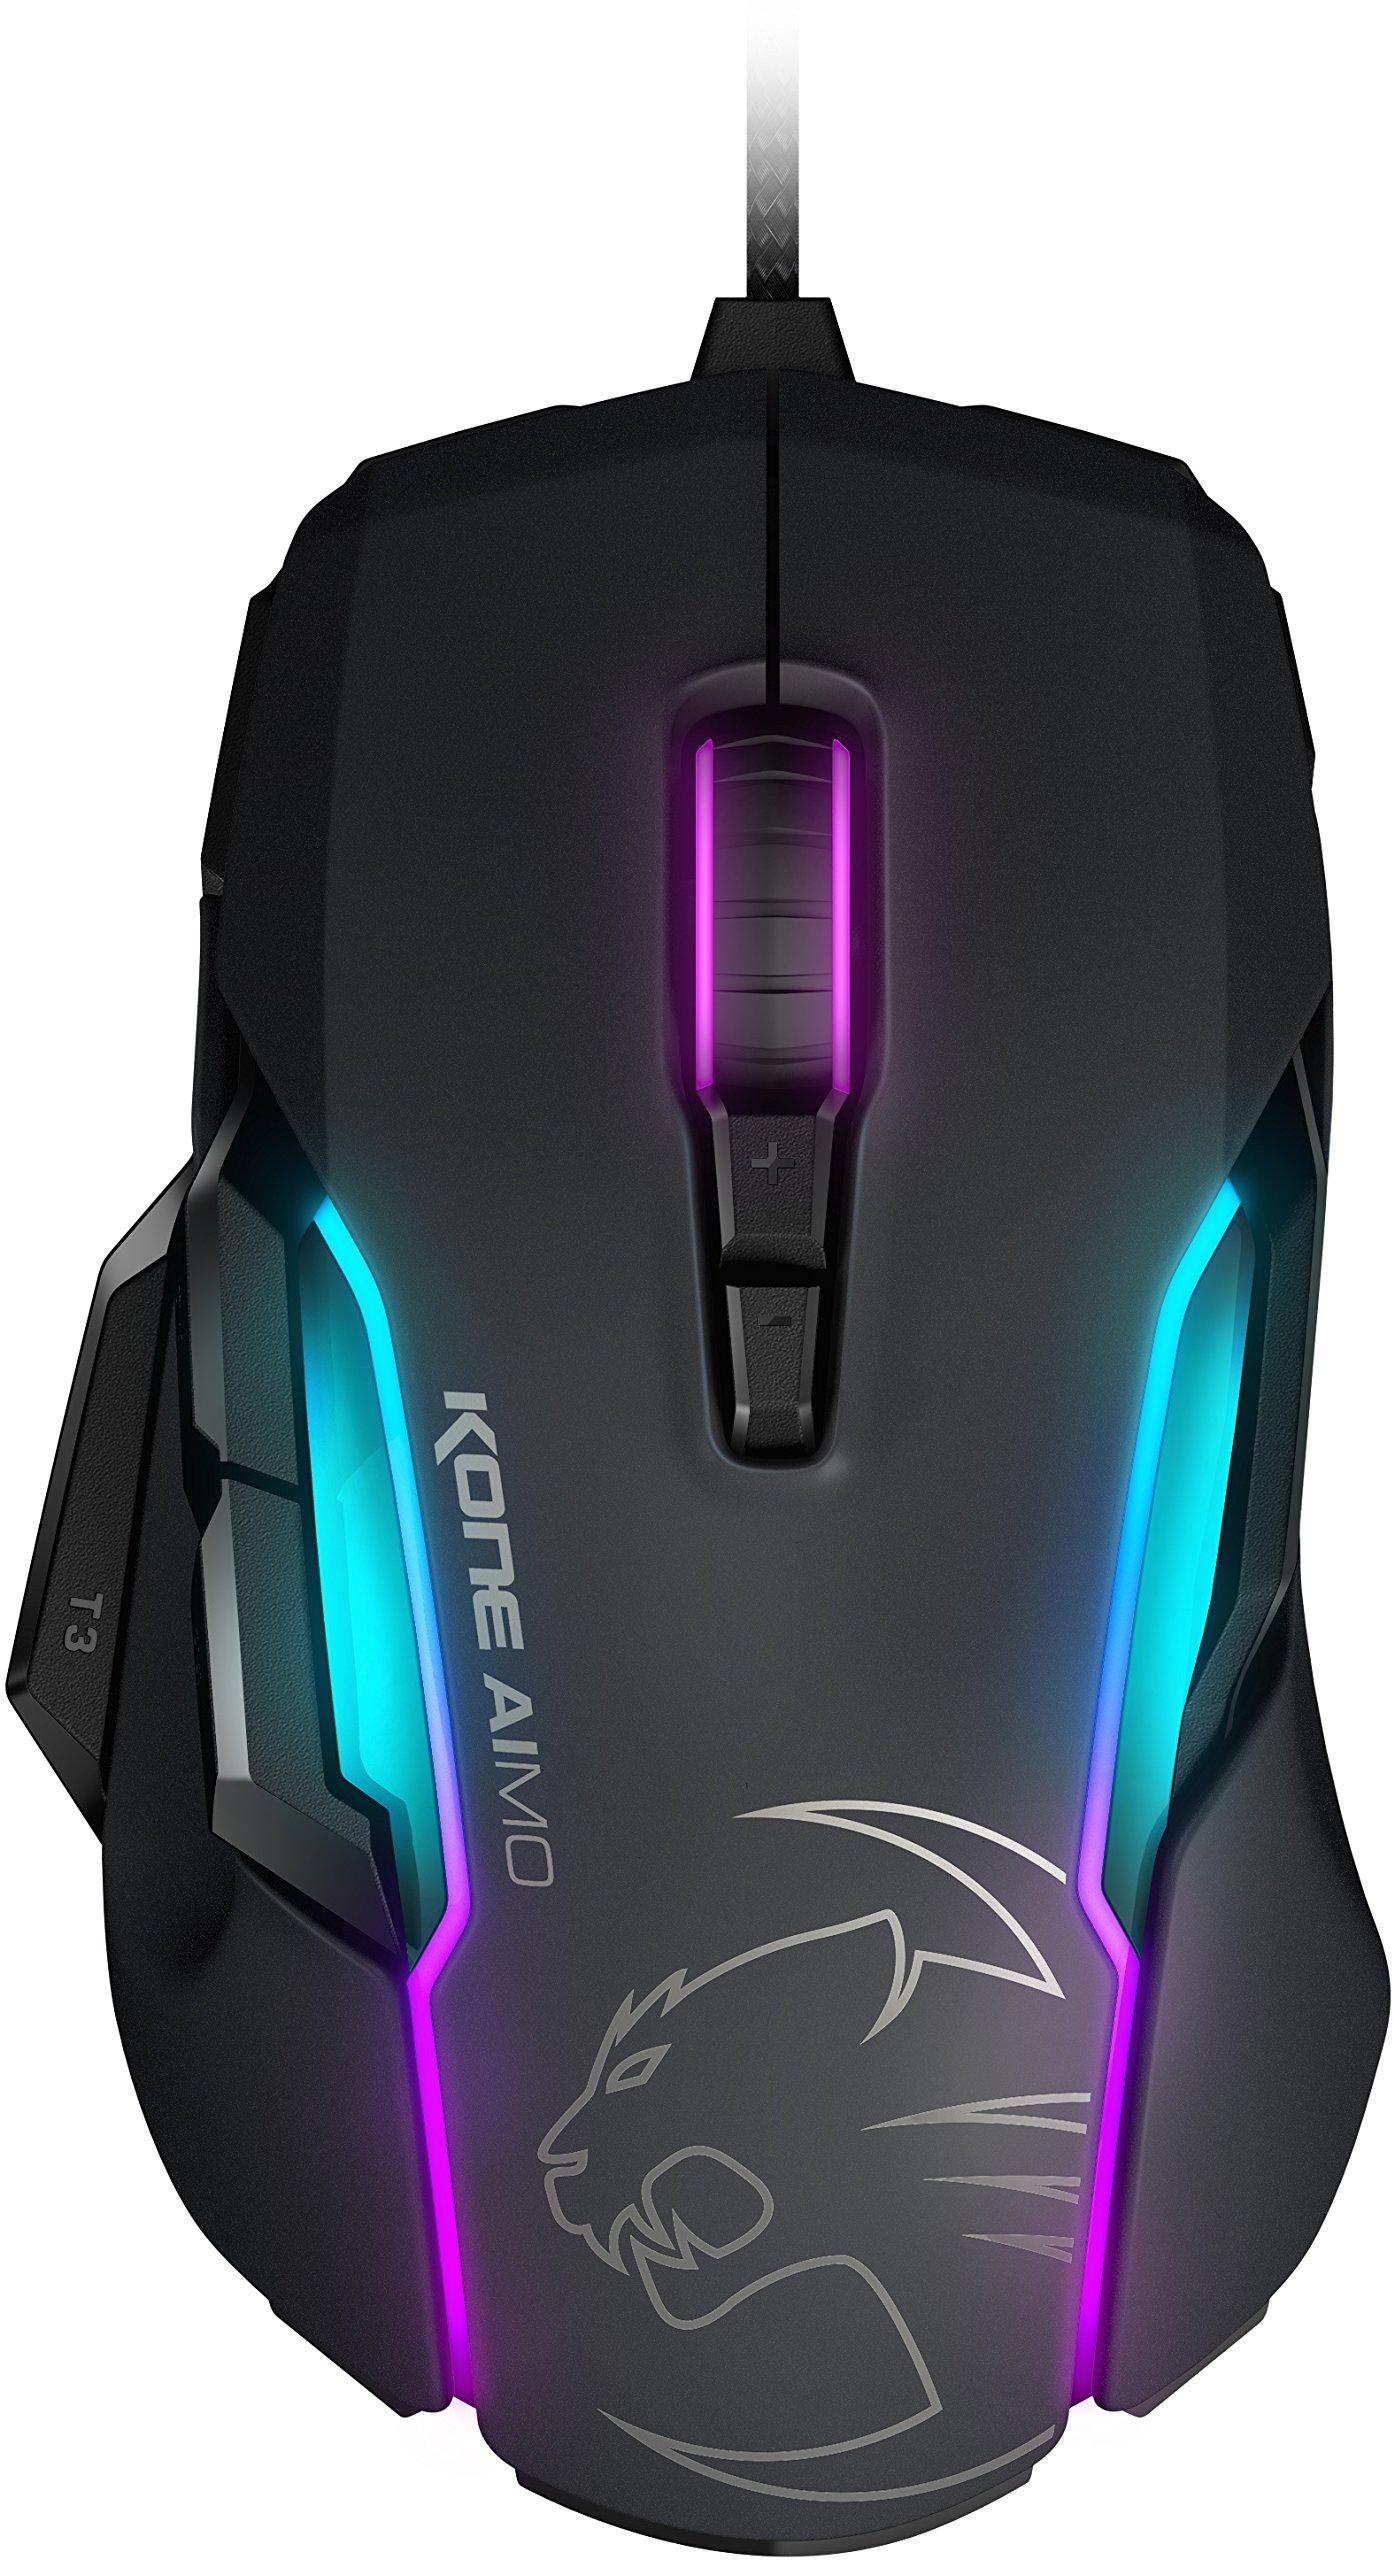 ROCCAT KONE AIMO - RGBA Smart Customization Gaming Mouse, Black (ROC-11-815-BK)